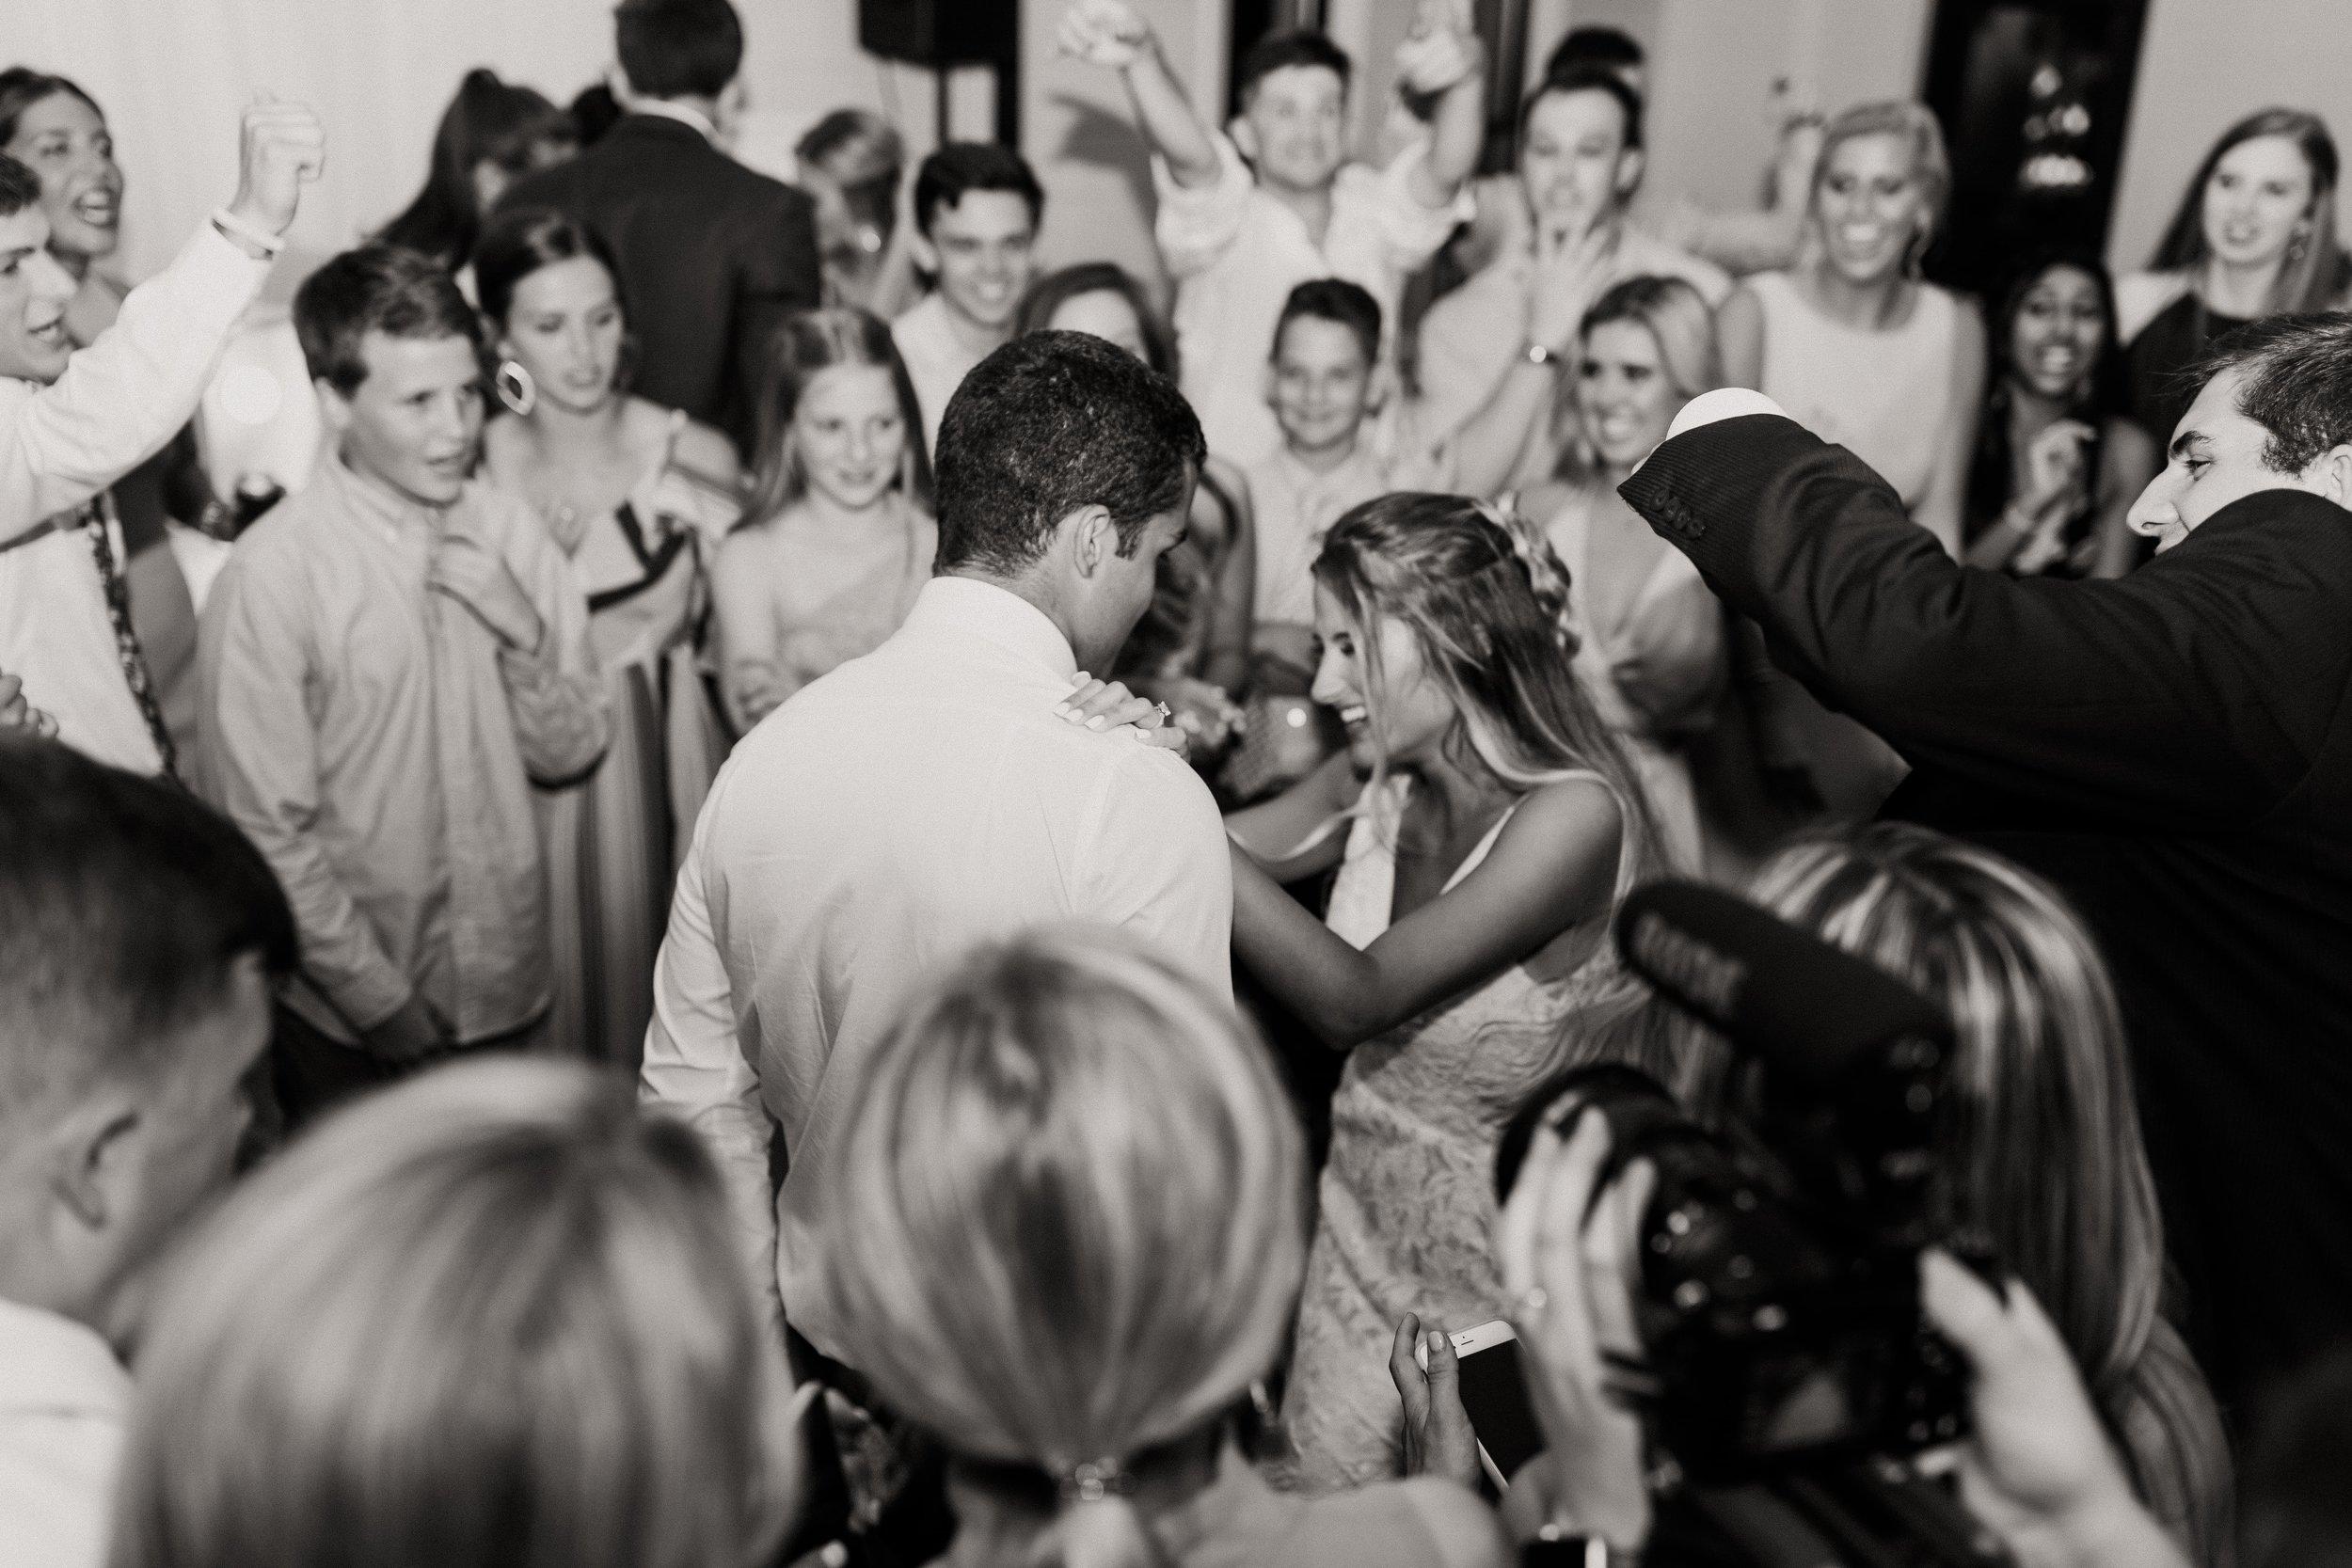 dancing tulsa wedding venue 1-min.jpg